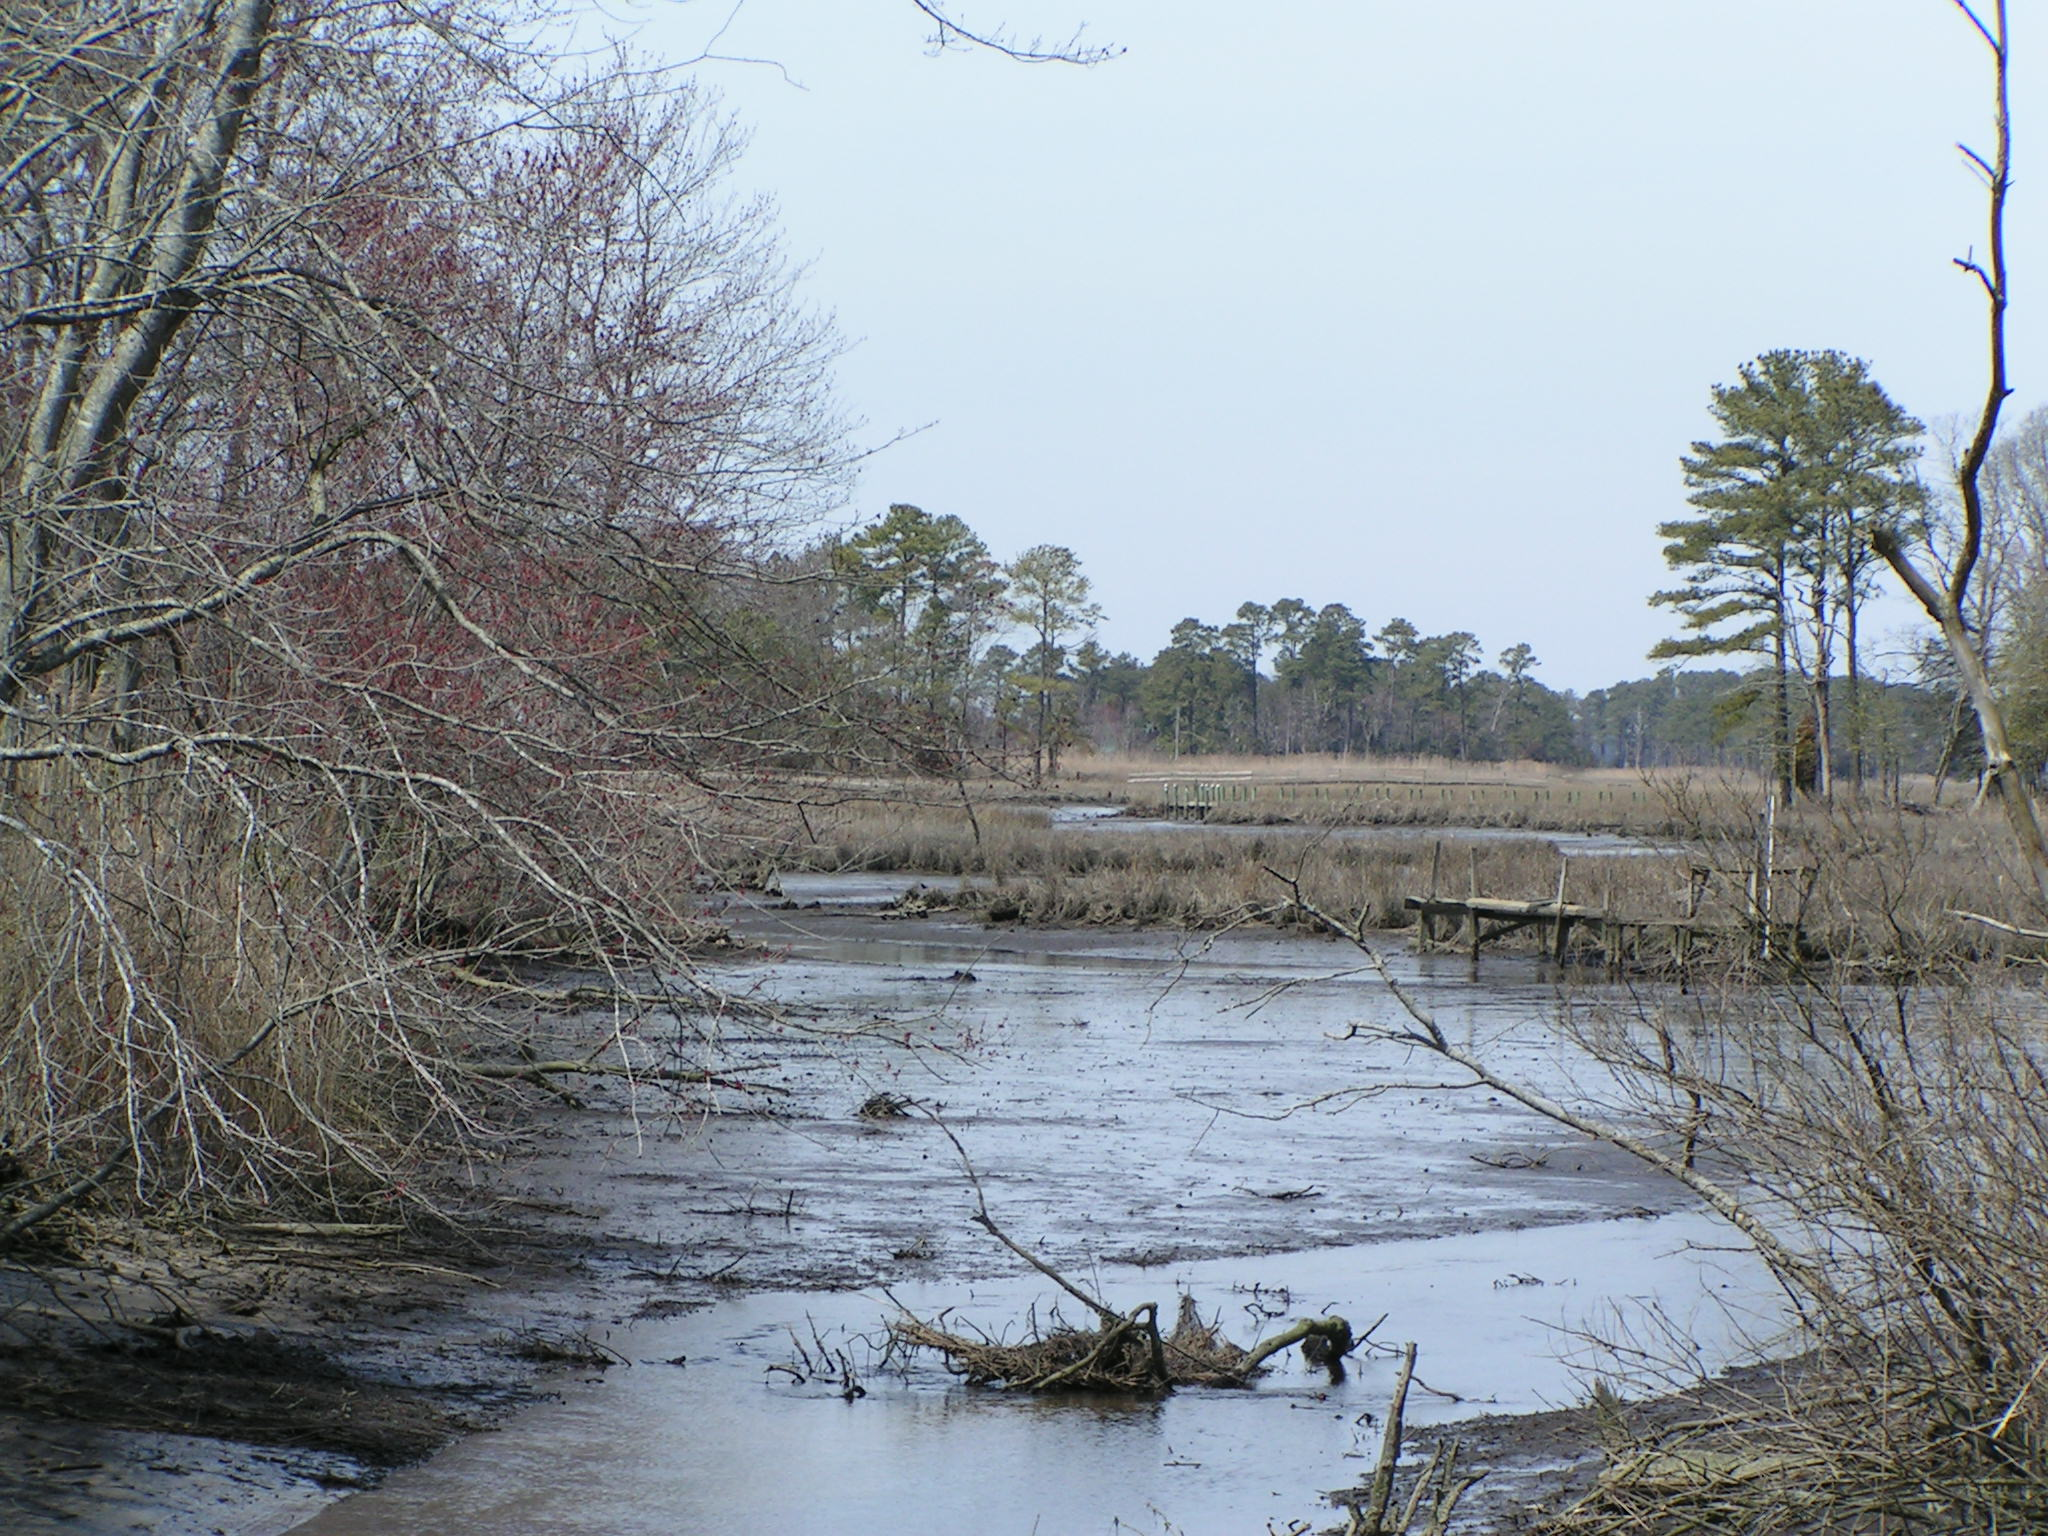 tidal creek, inland bays, indian river, indian river bay,vlasic plant, pinnacle, allen harim